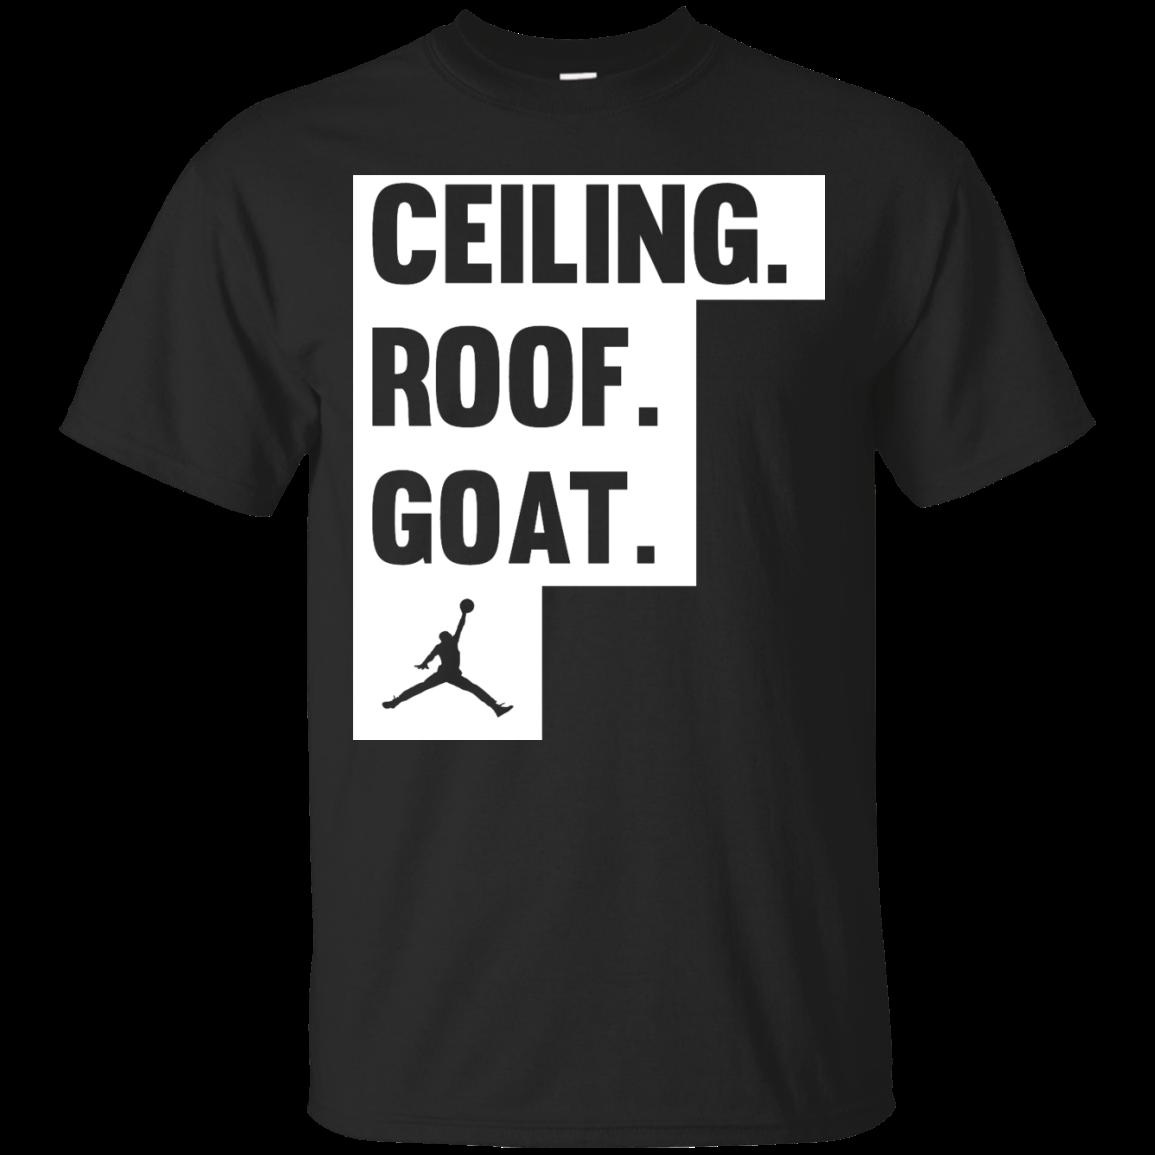 image 944px Jordan: Ceiling Roof Goat T Shirt, Hoodies, Tank